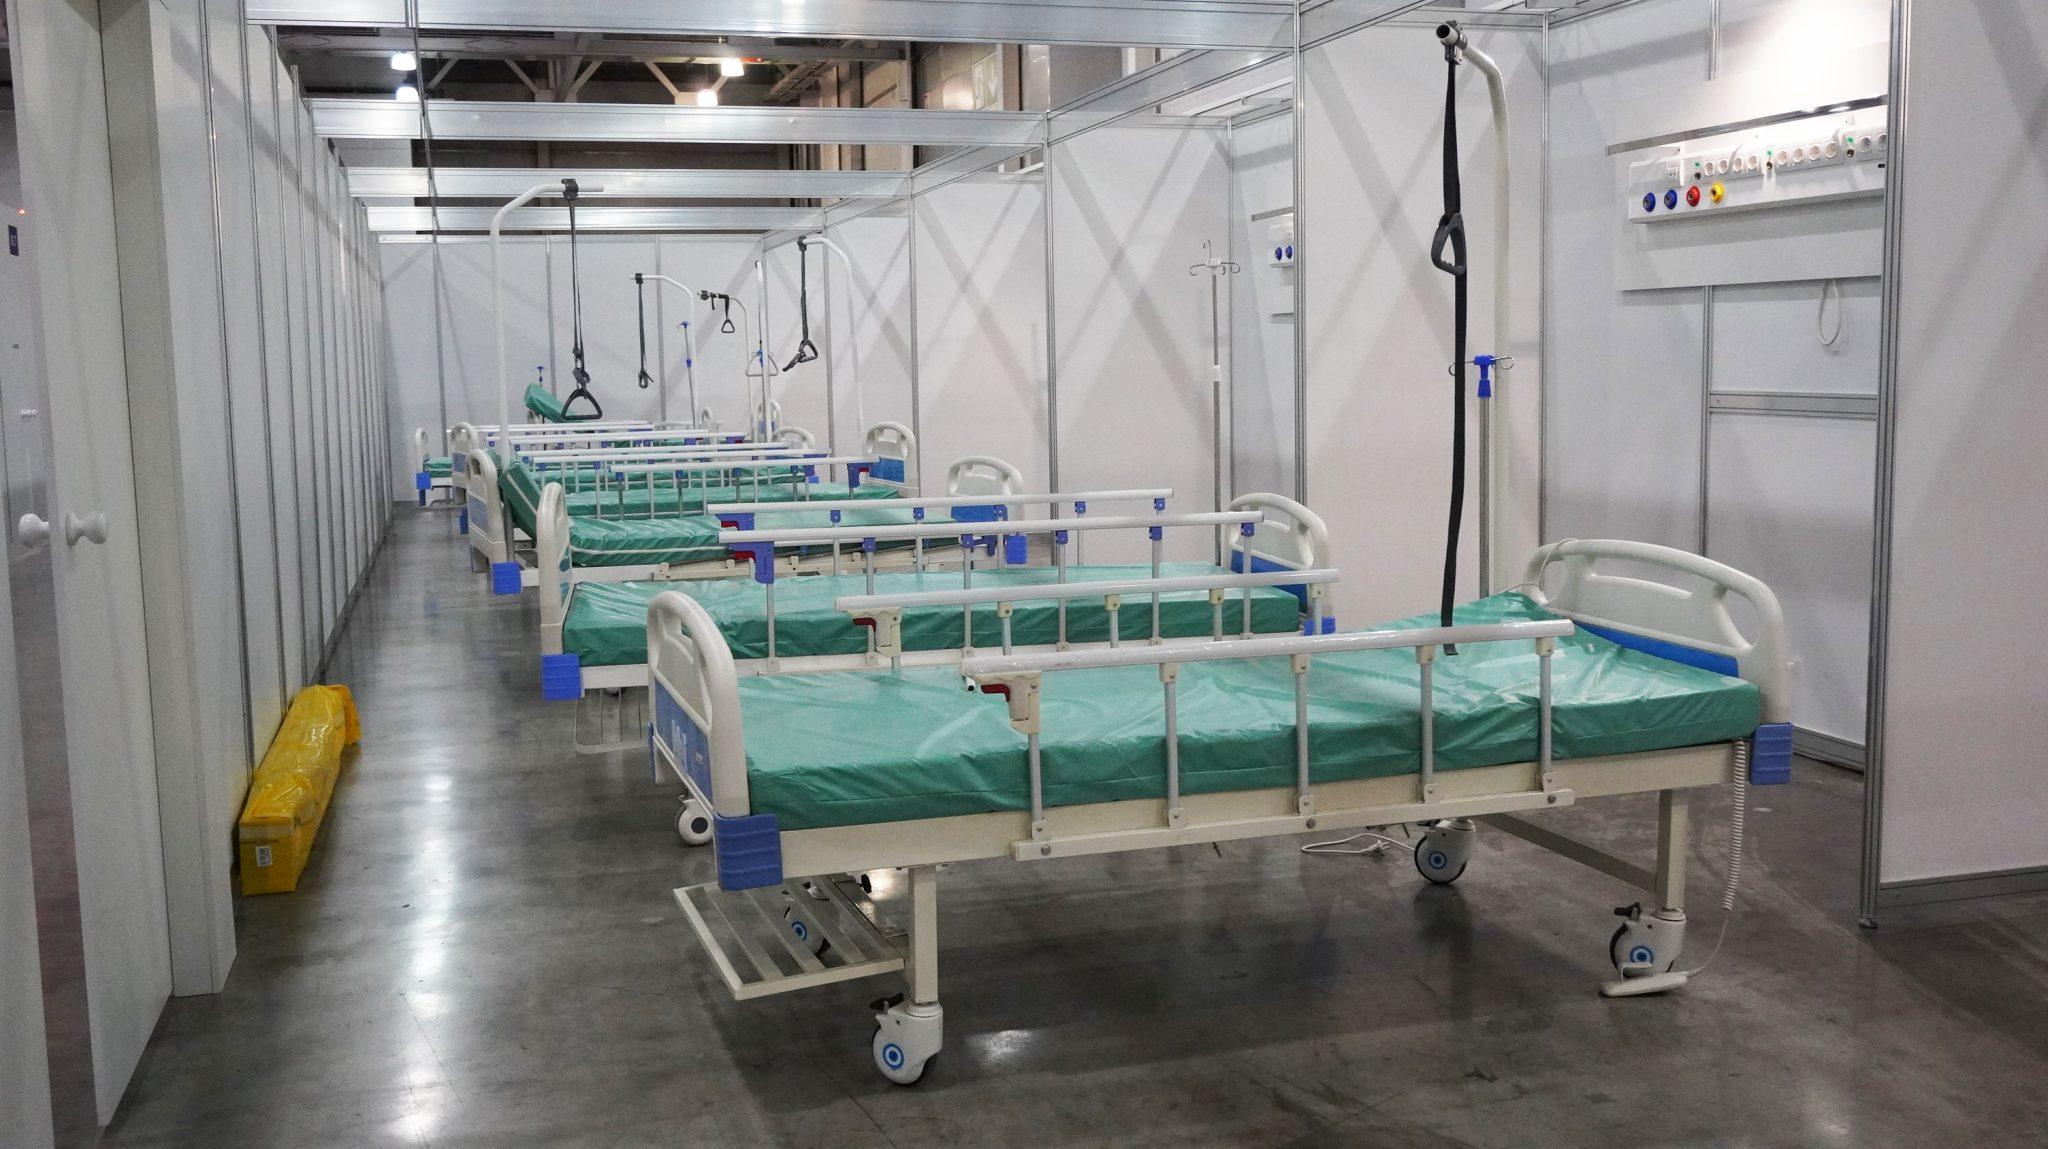 Medical,Beds,In,The,Coronavirus,Hospital